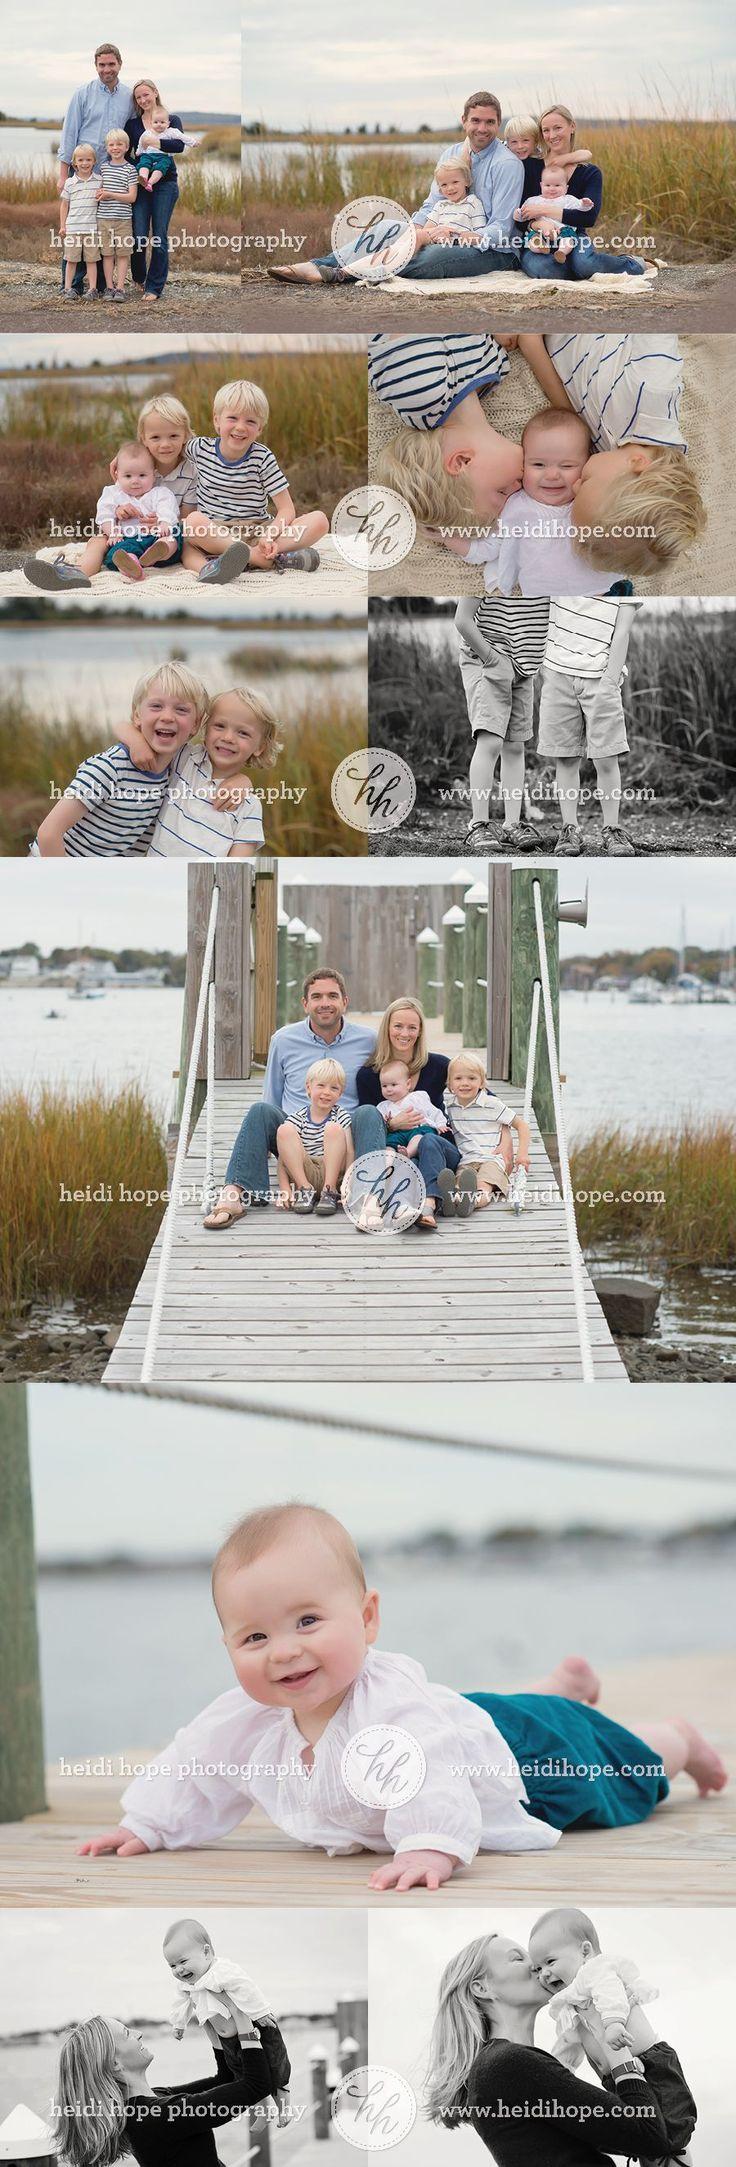 Beach Family Session | Heidi Hope Photography